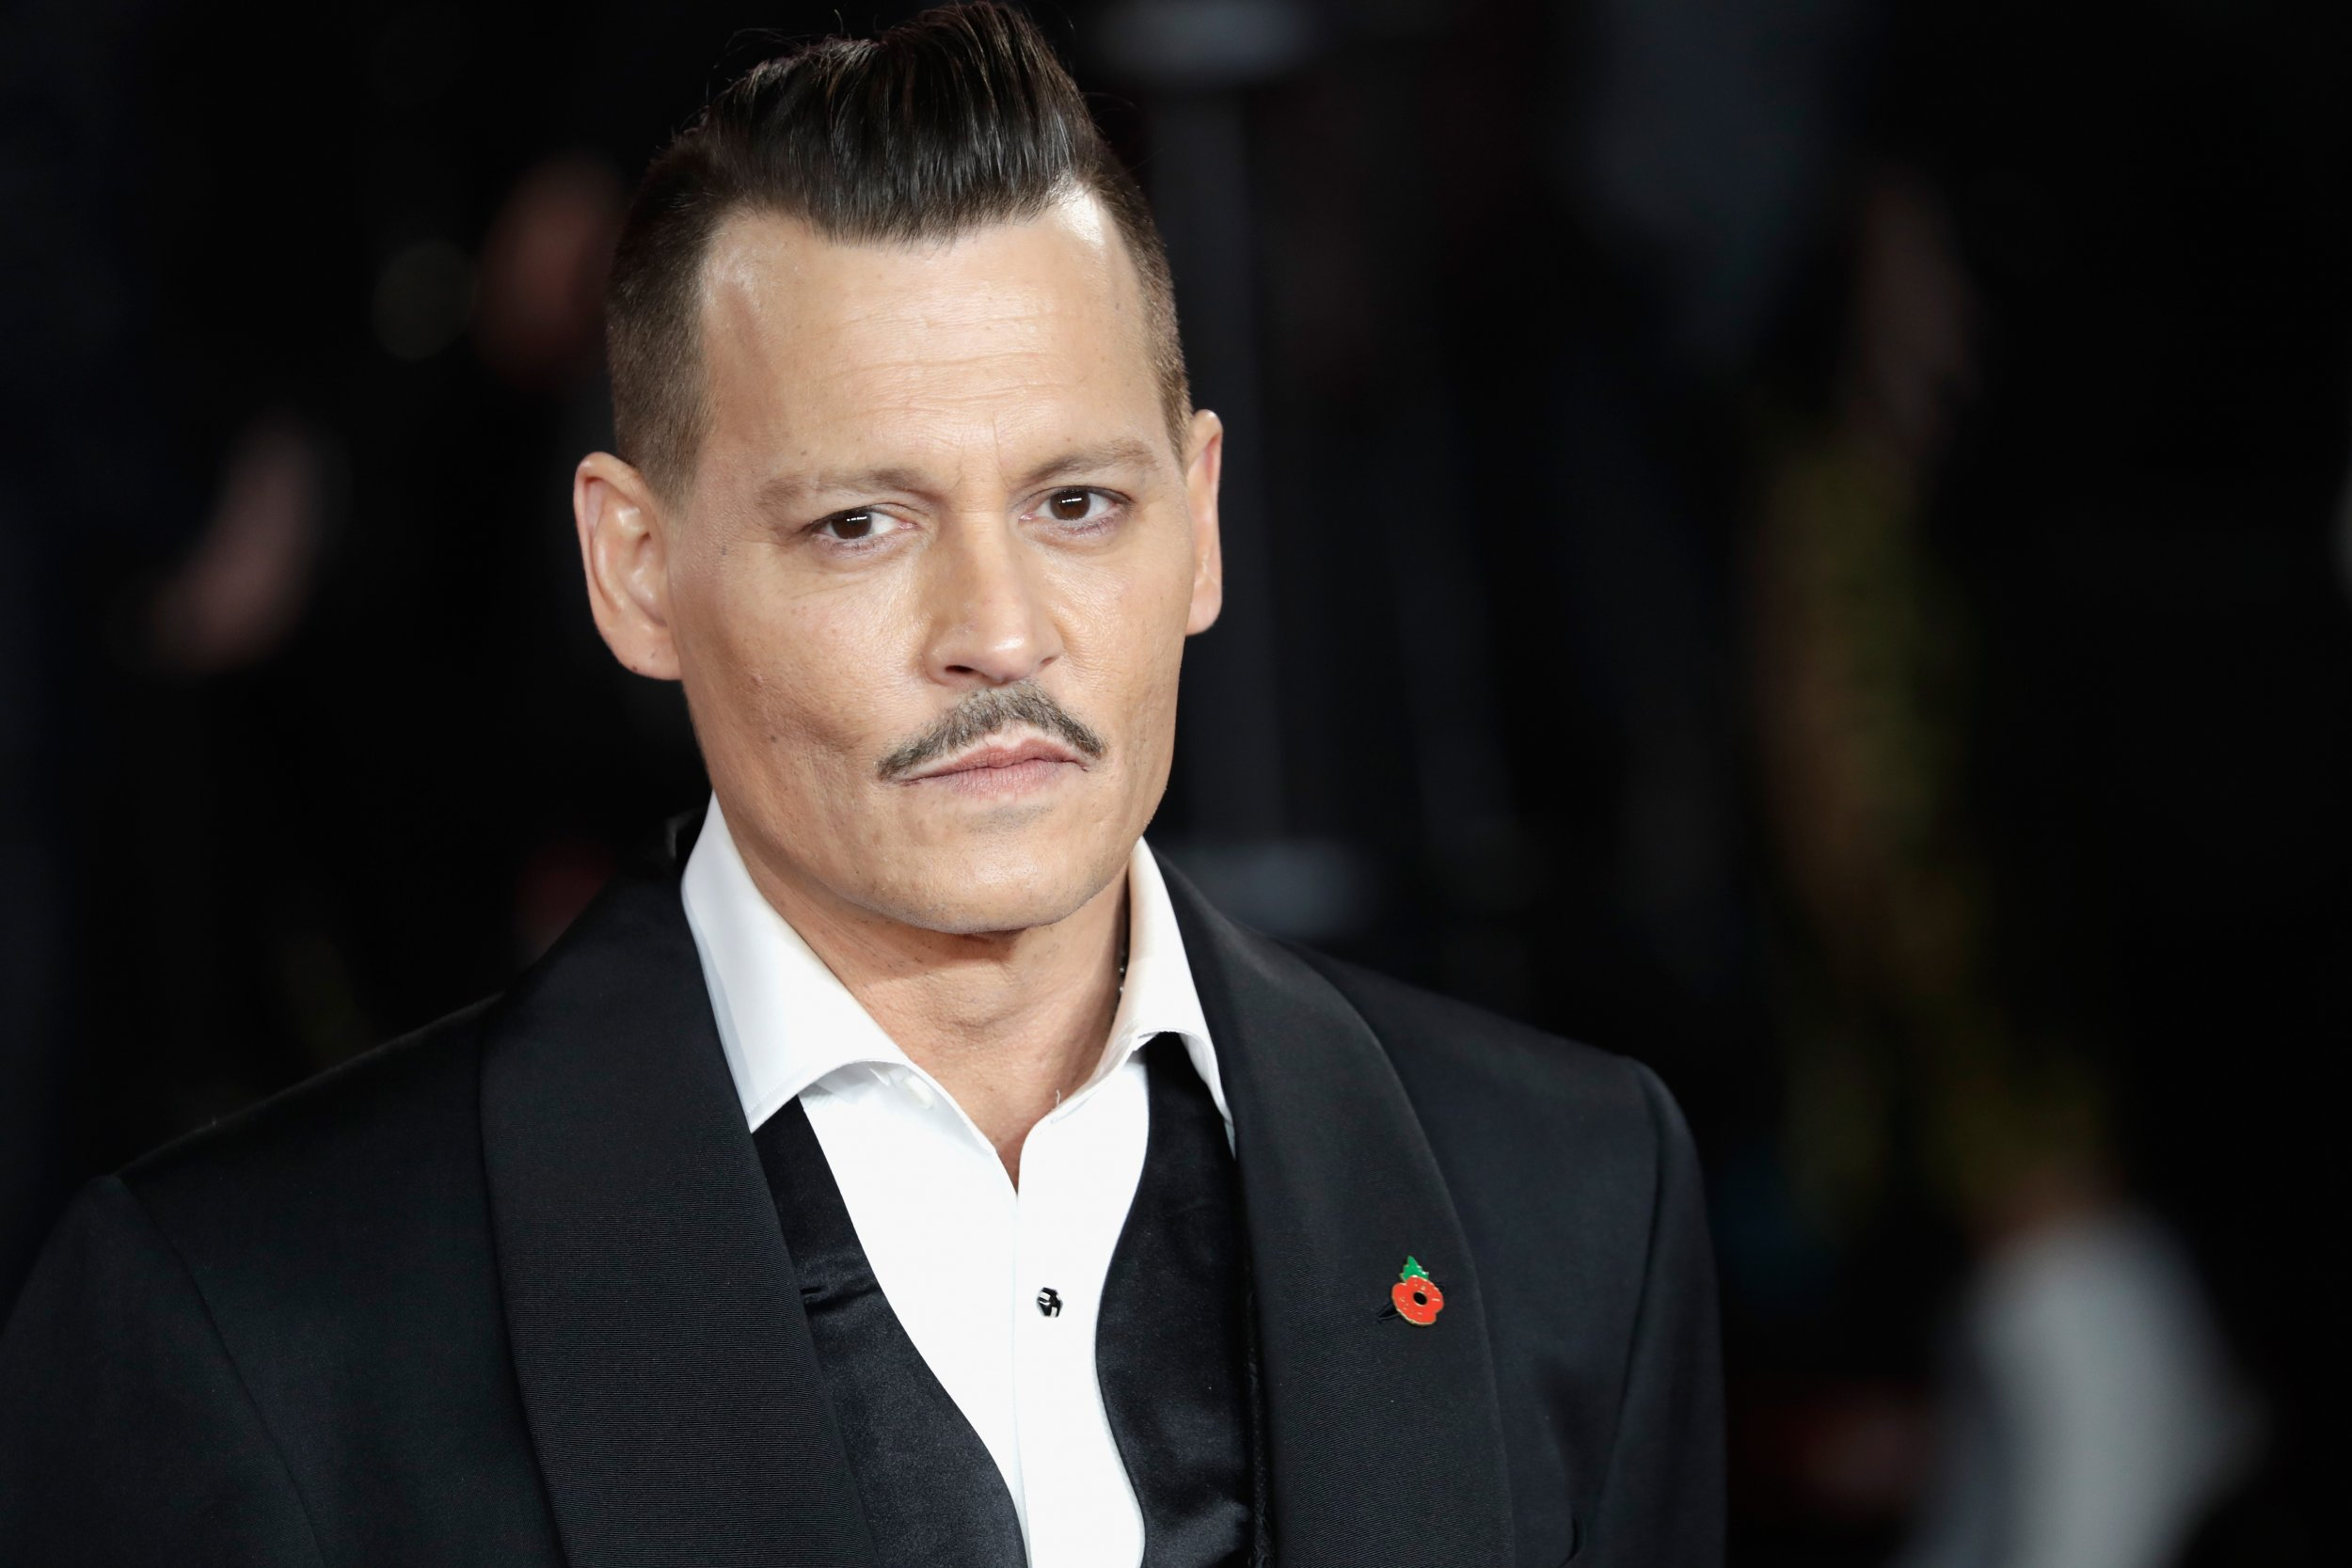 Johnny Depp's Allegedly 'Victim' of Amber Heard's 'Violent Abuse'